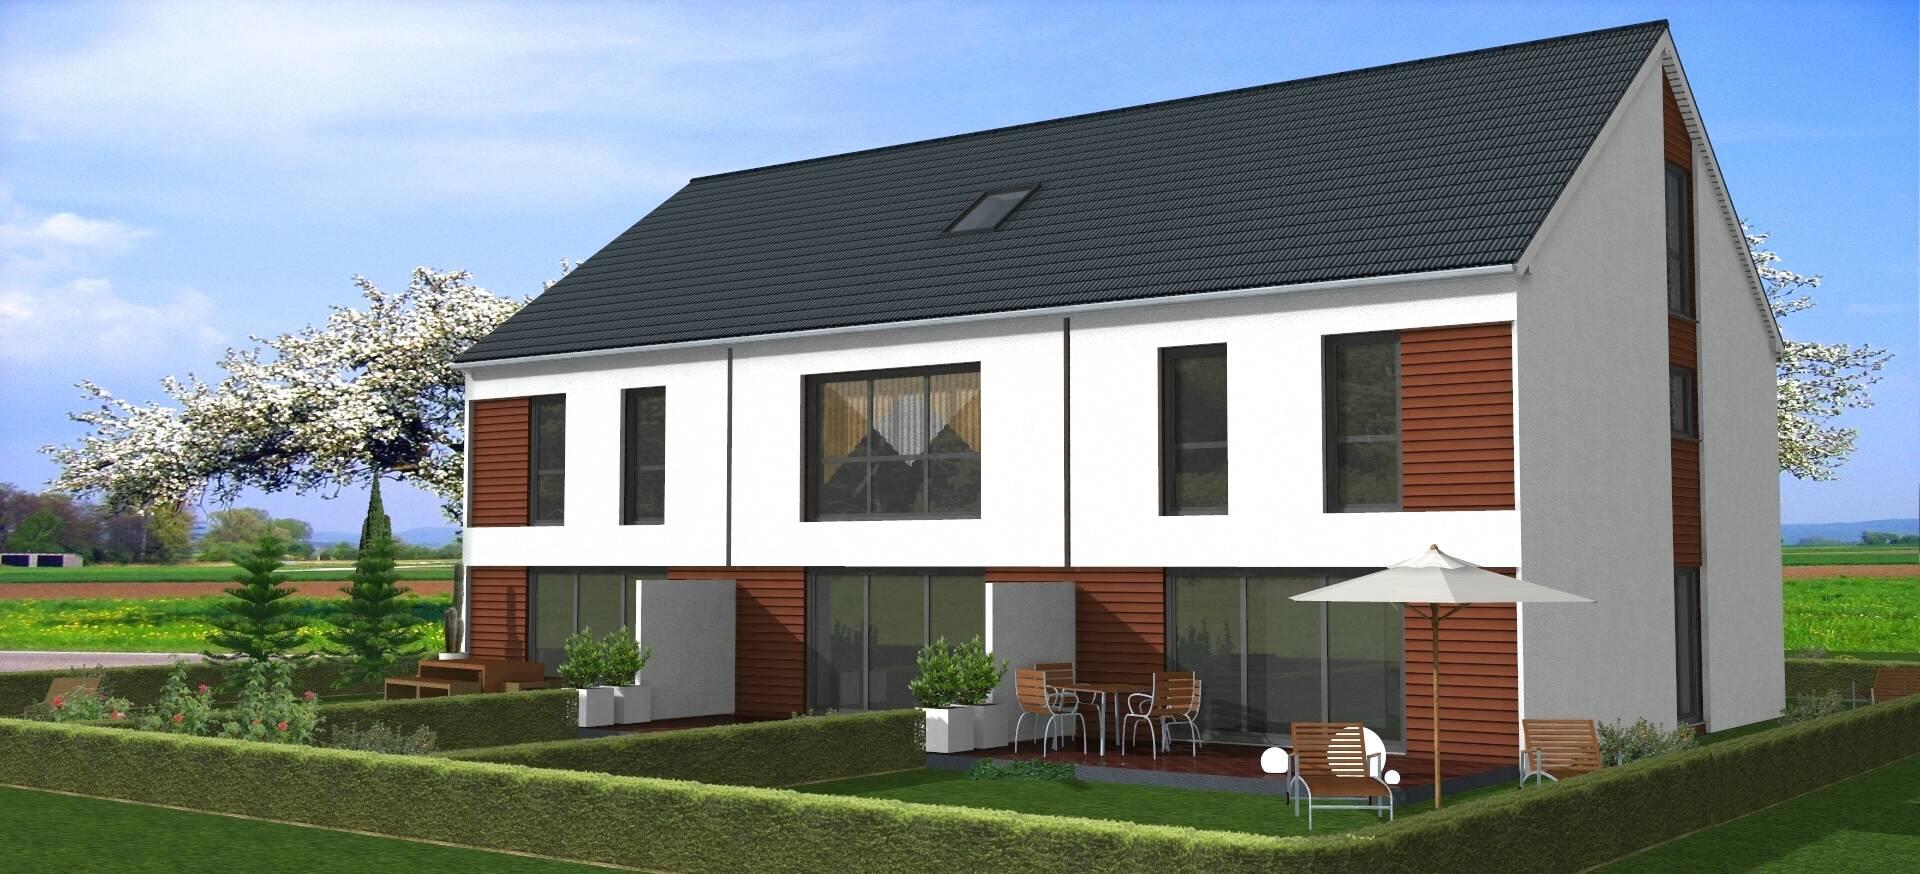 eihenhäuser - Häuser Preise nbieter Infos size: 1920 x 874 post ID: 6 File size: 0 B